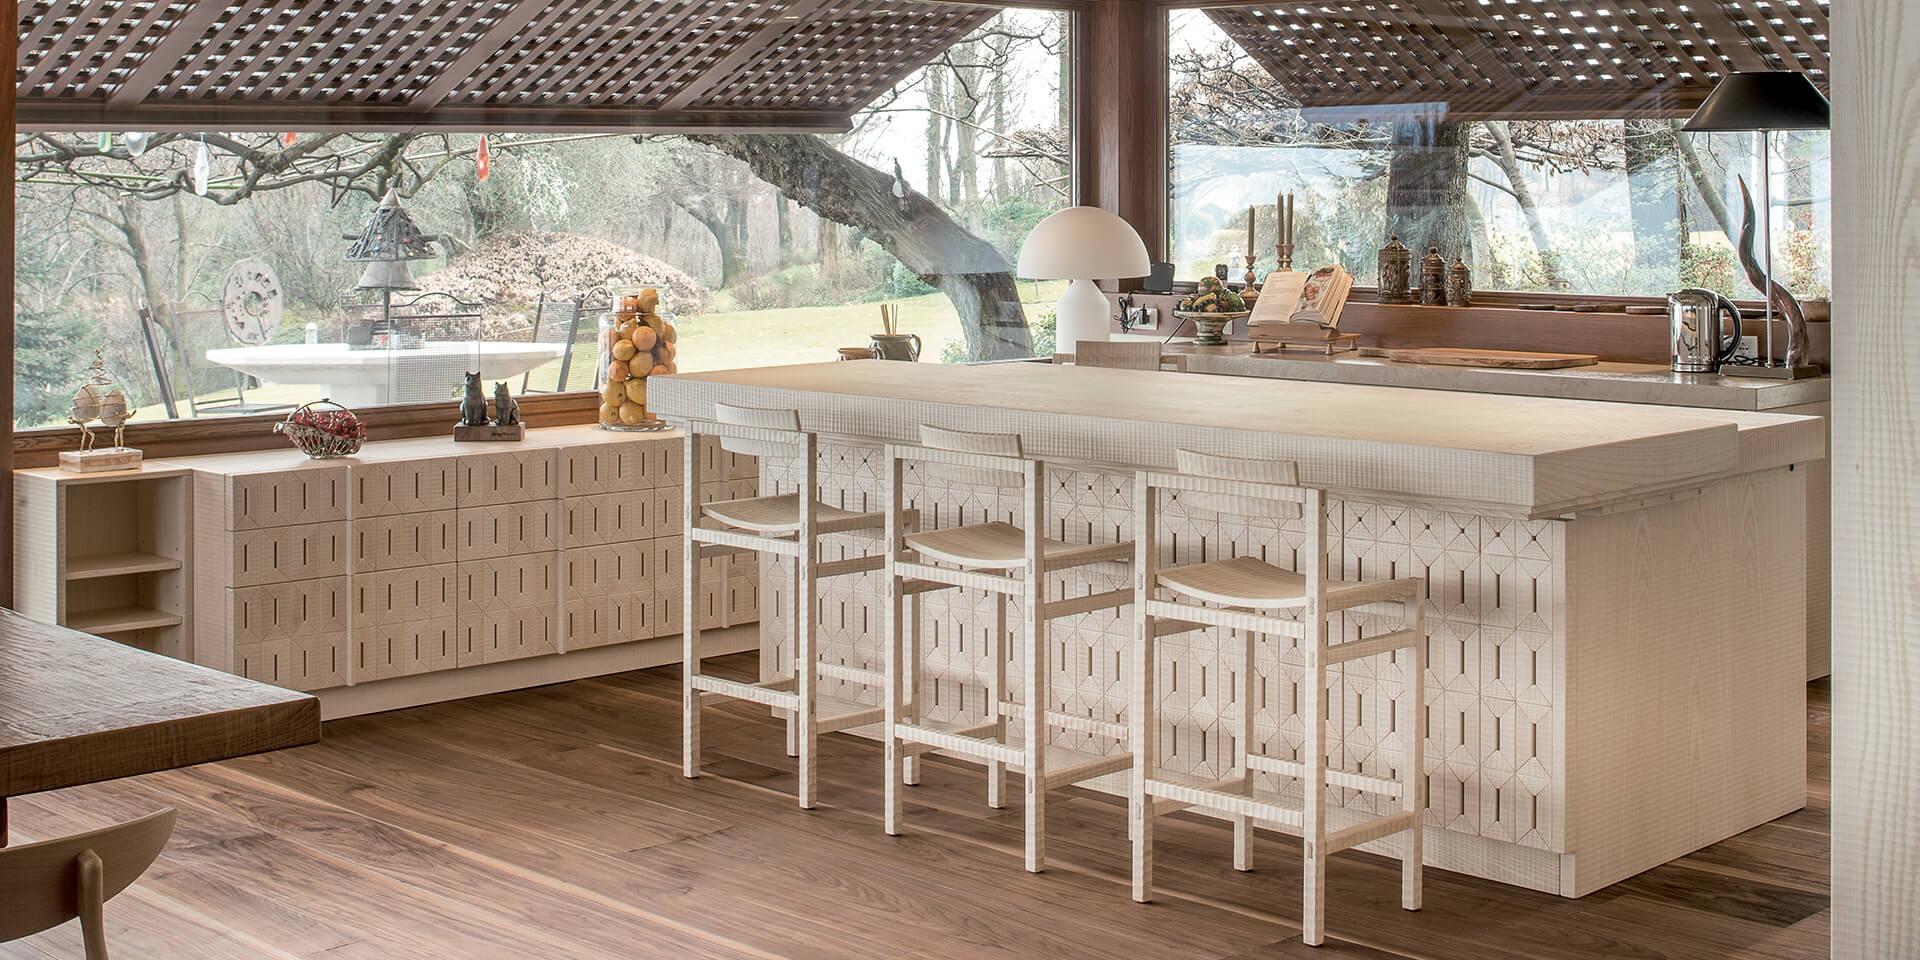 Cucina in legno Cucine Habito